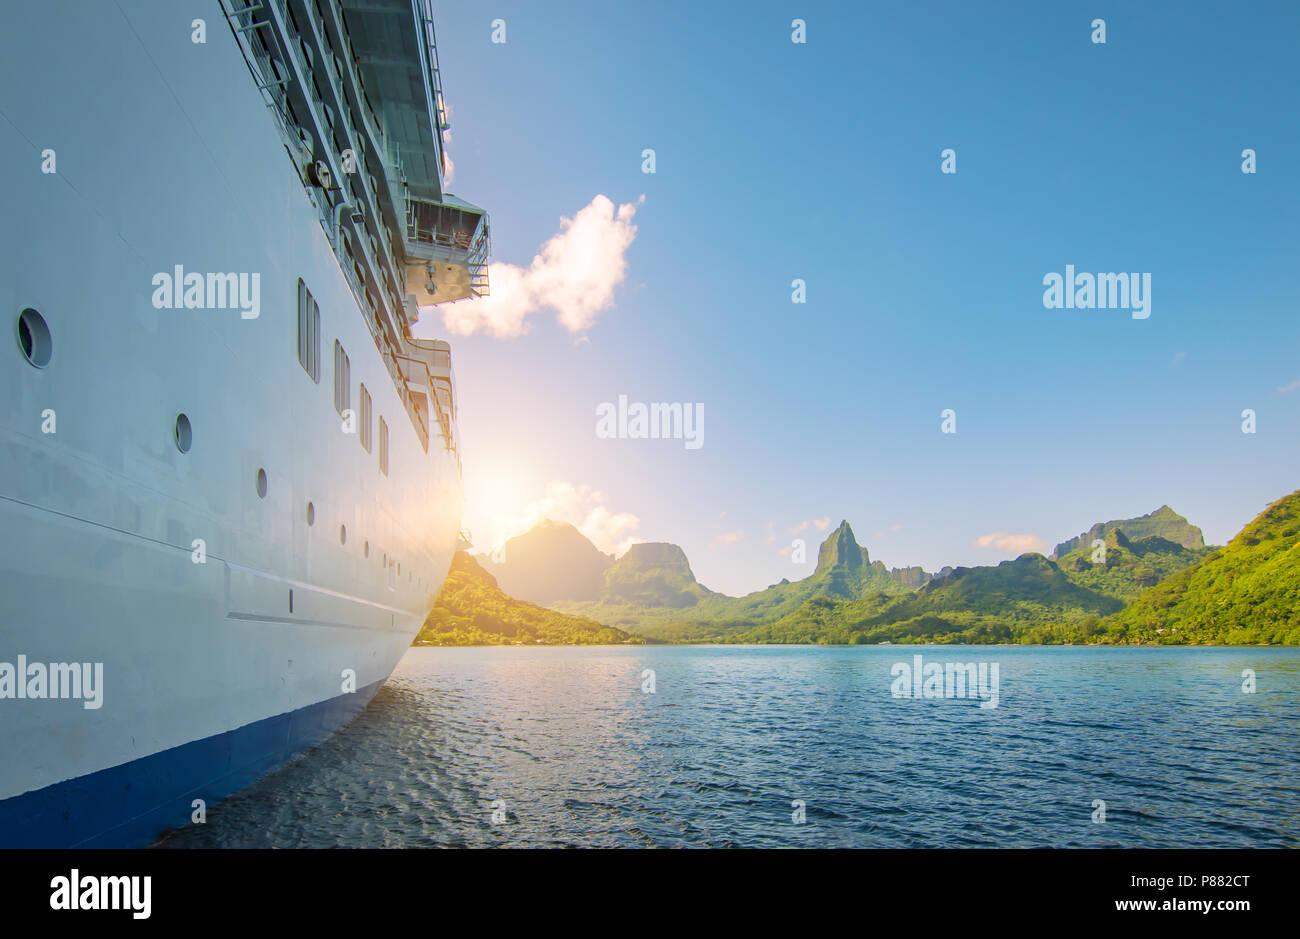 Vista lateral del crucero anclado al atardecer. Fondo de montaña. Imagen De Stock